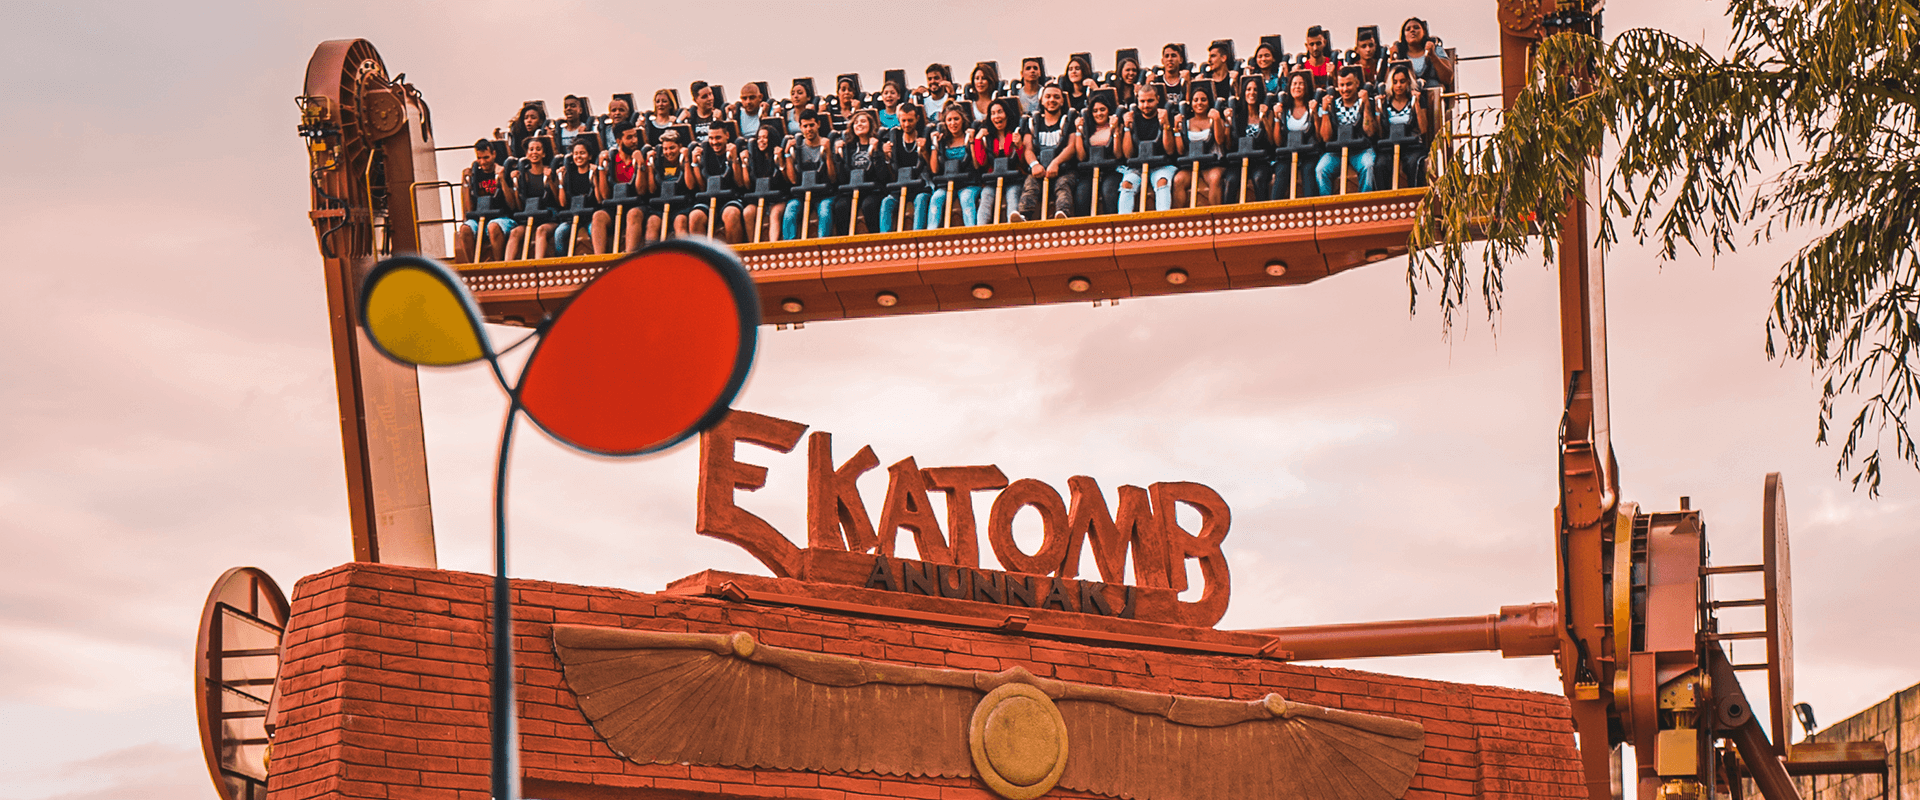 Ekatomb - Hopi Hari